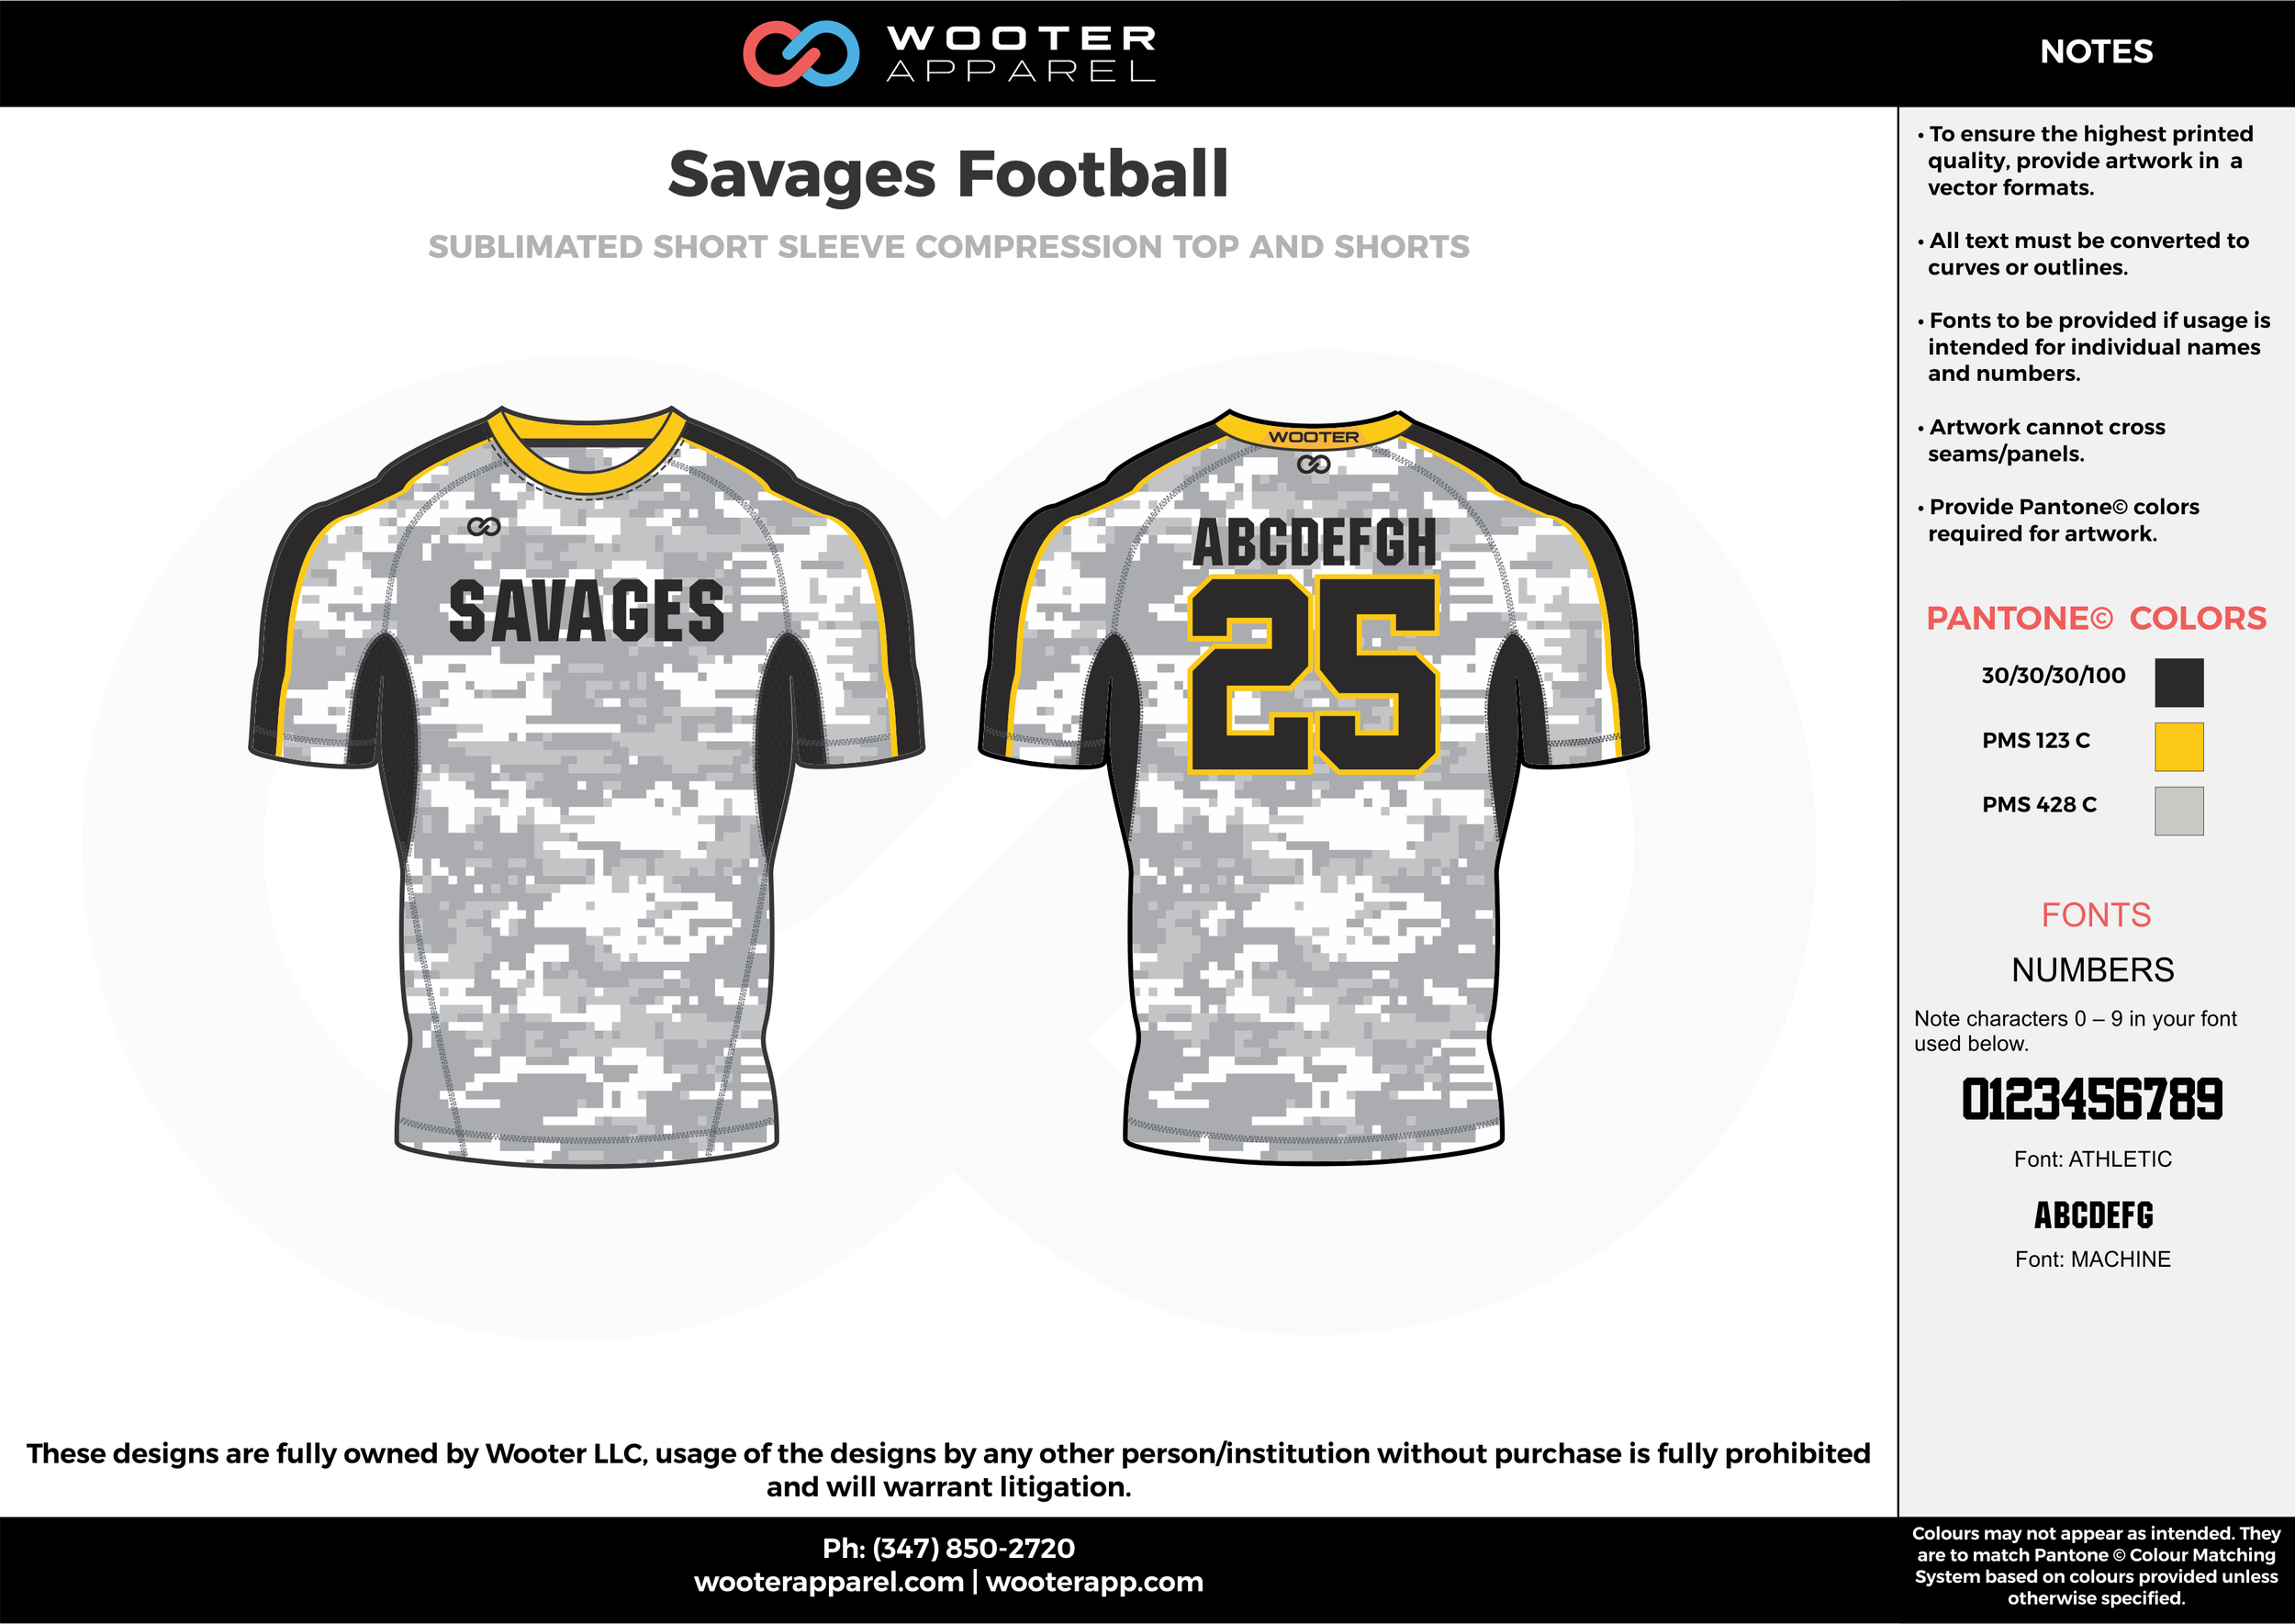 Savages Football white gray yellow football uniforms jerseys top